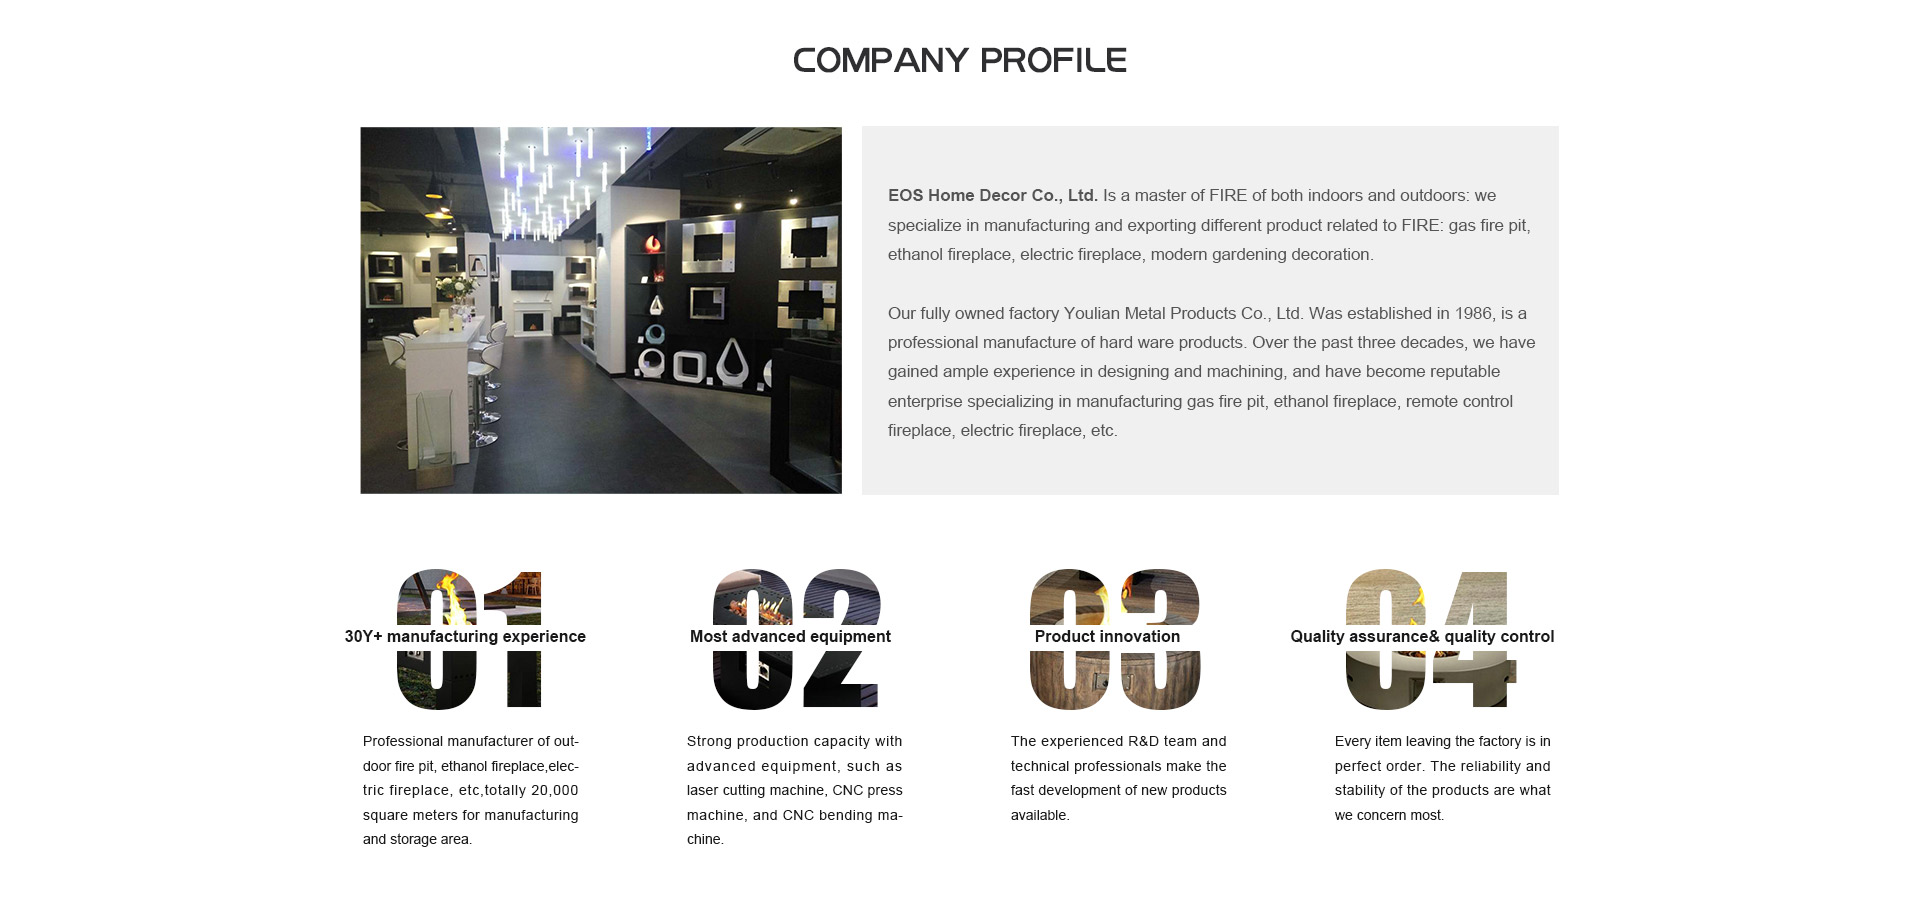 Guangzhou EOS Home Decor Co Ltd